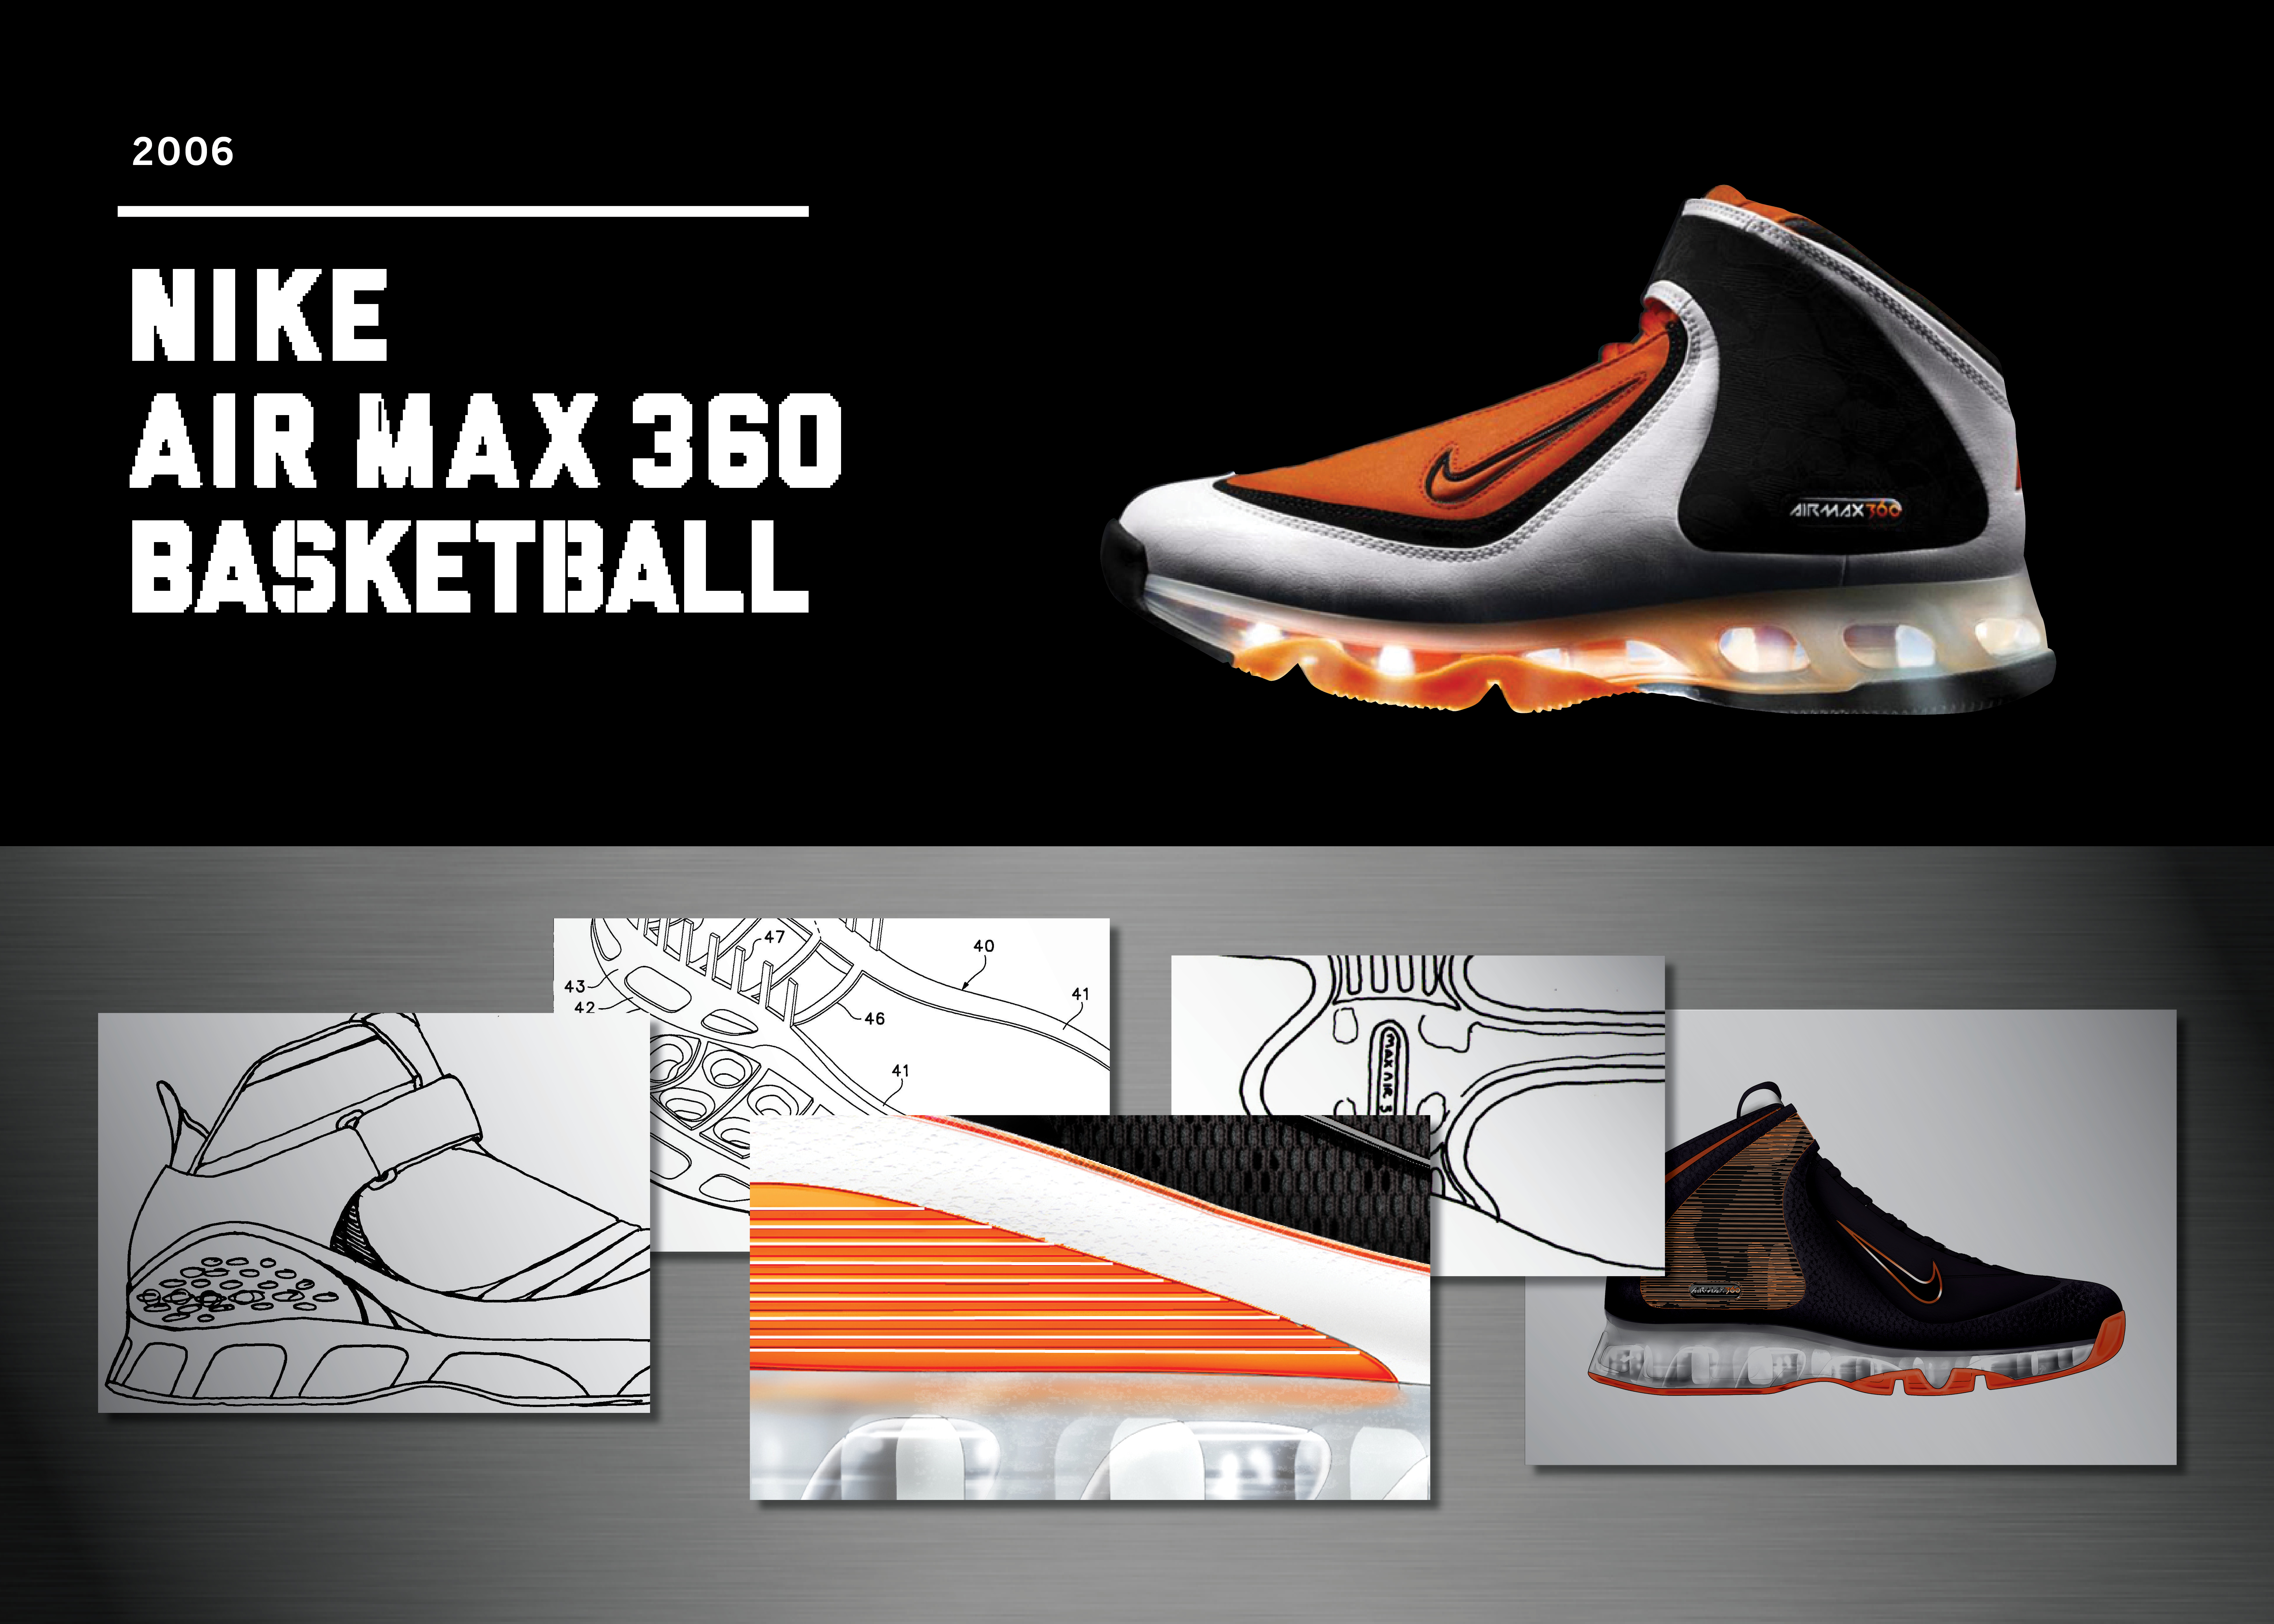 nike 360 basketball shoes